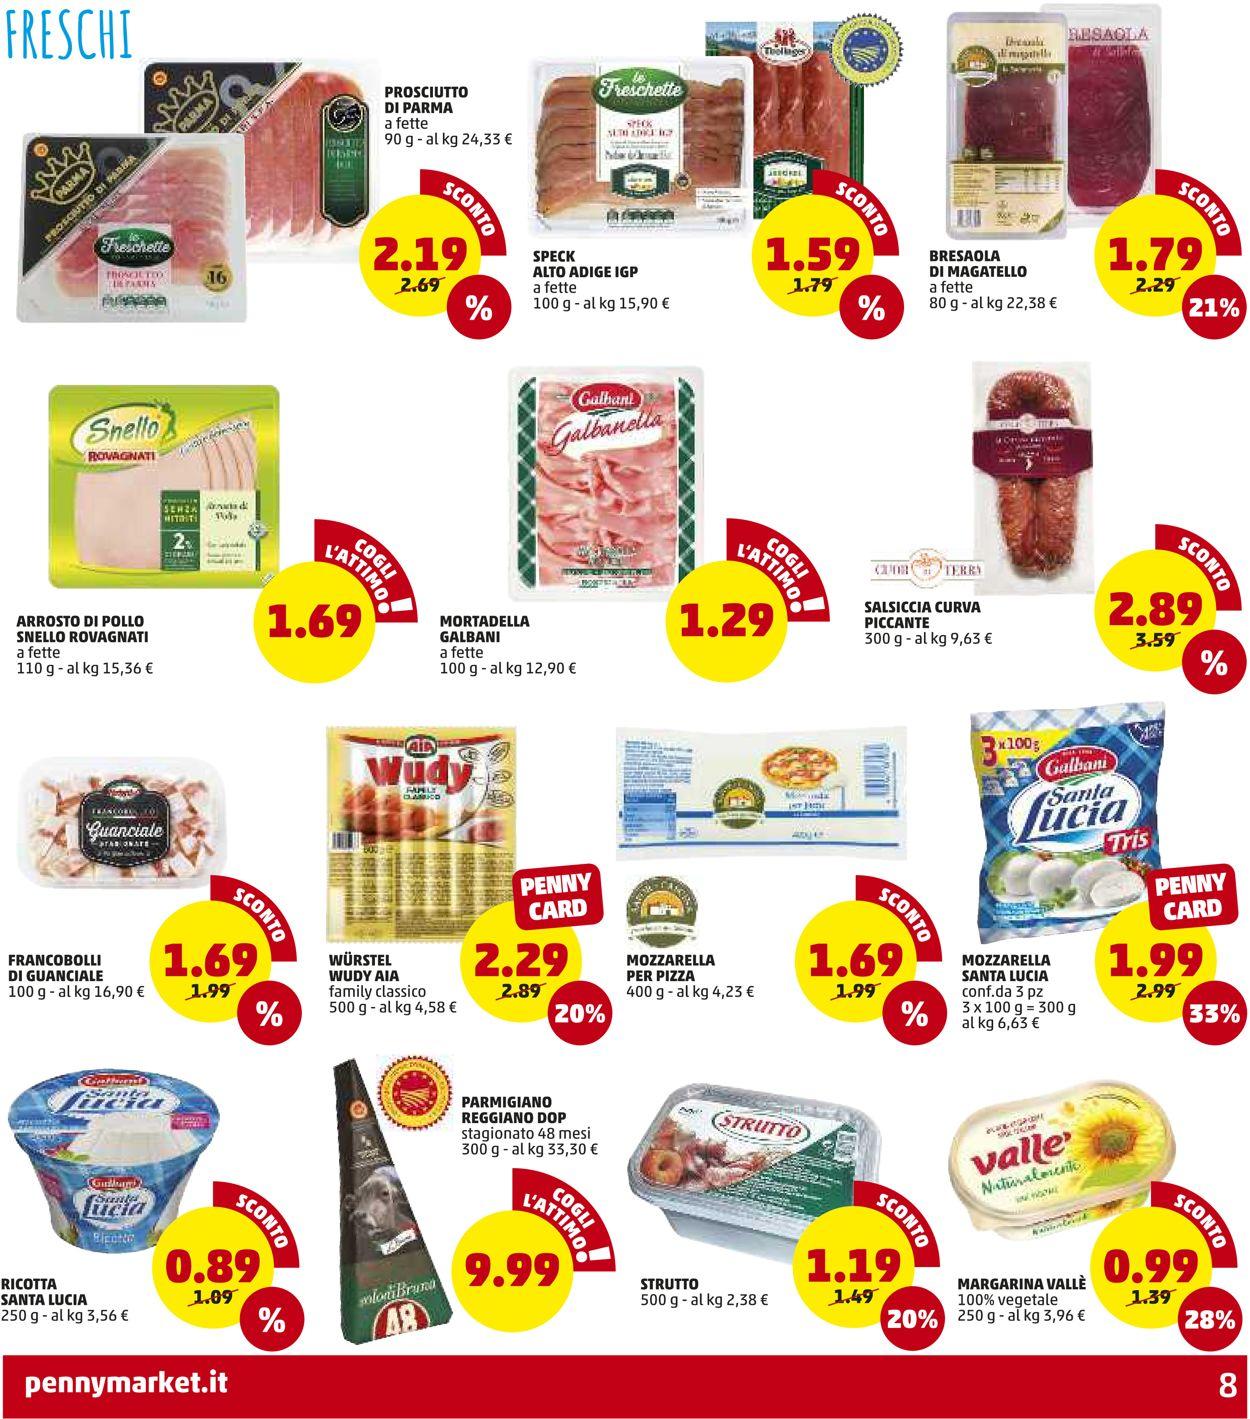 Volantino Penny Market - Natale 2020 - SUD ITALIA - Offerte 03/12-13/12/2020 (Pagina 8)